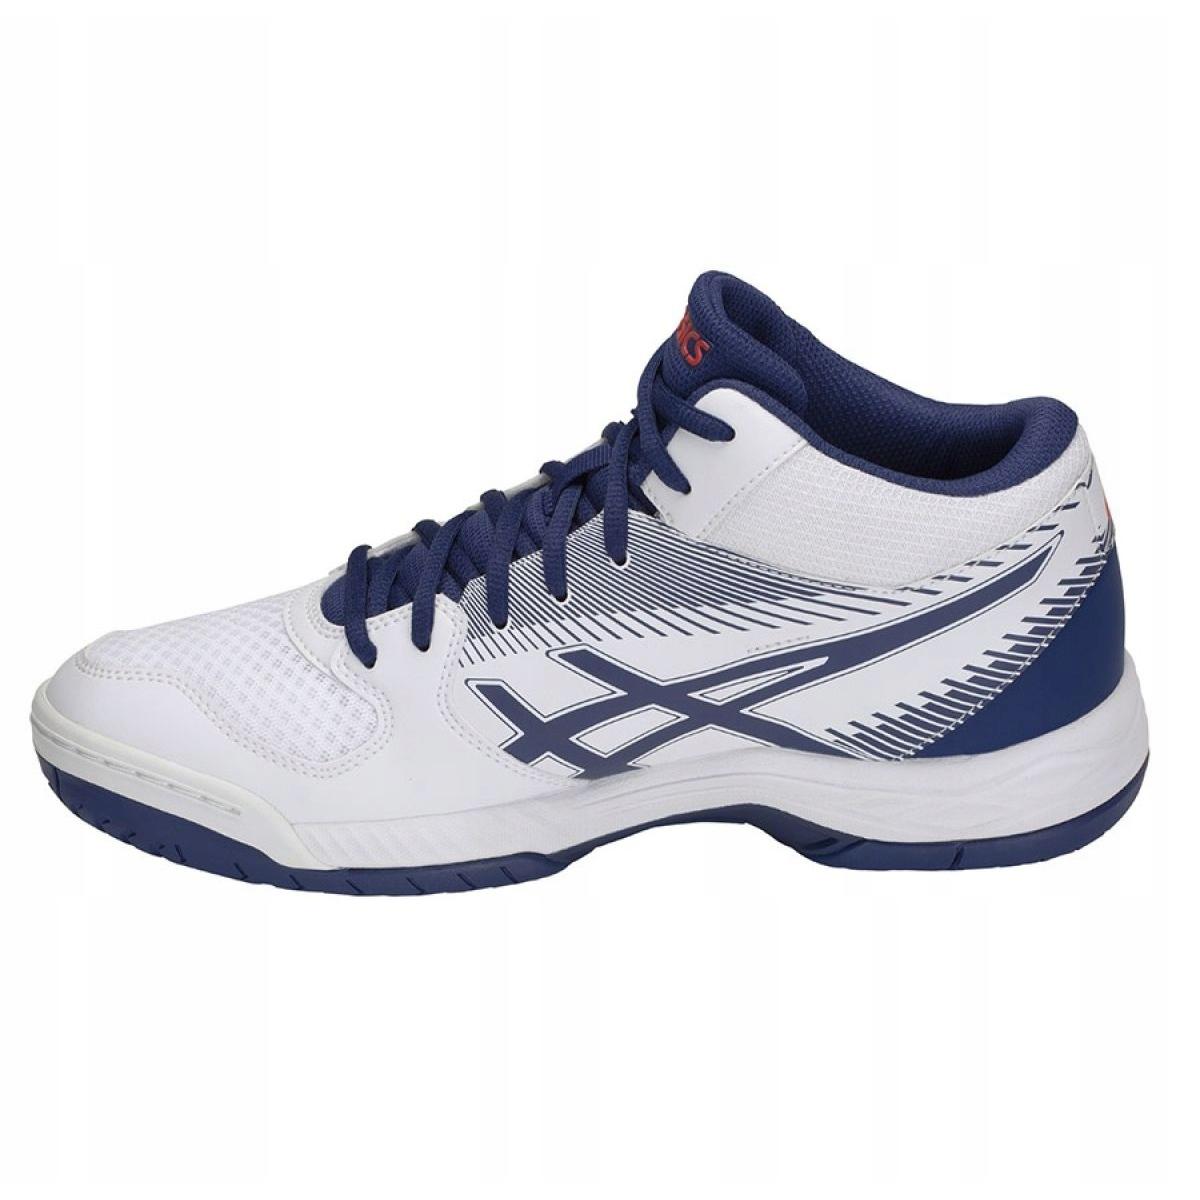 Zapatillas de voleibol Asics Gel Task M B703Y 100